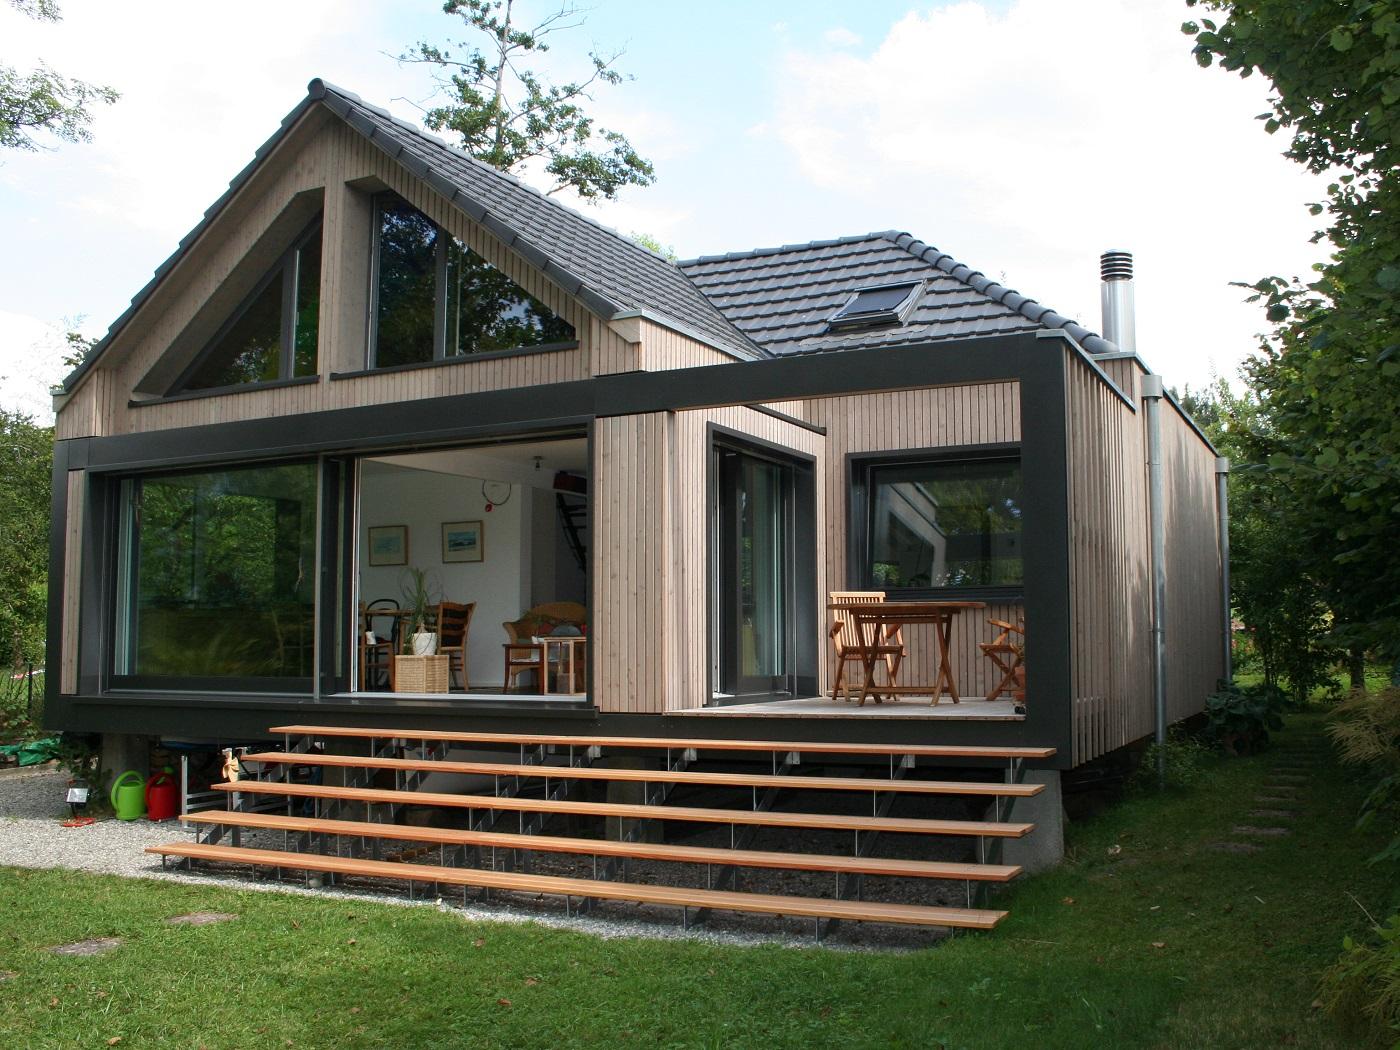 gesamtsanierung haus am see kohler seeland ag. Black Bedroom Furniture Sets. Home Design Ideas